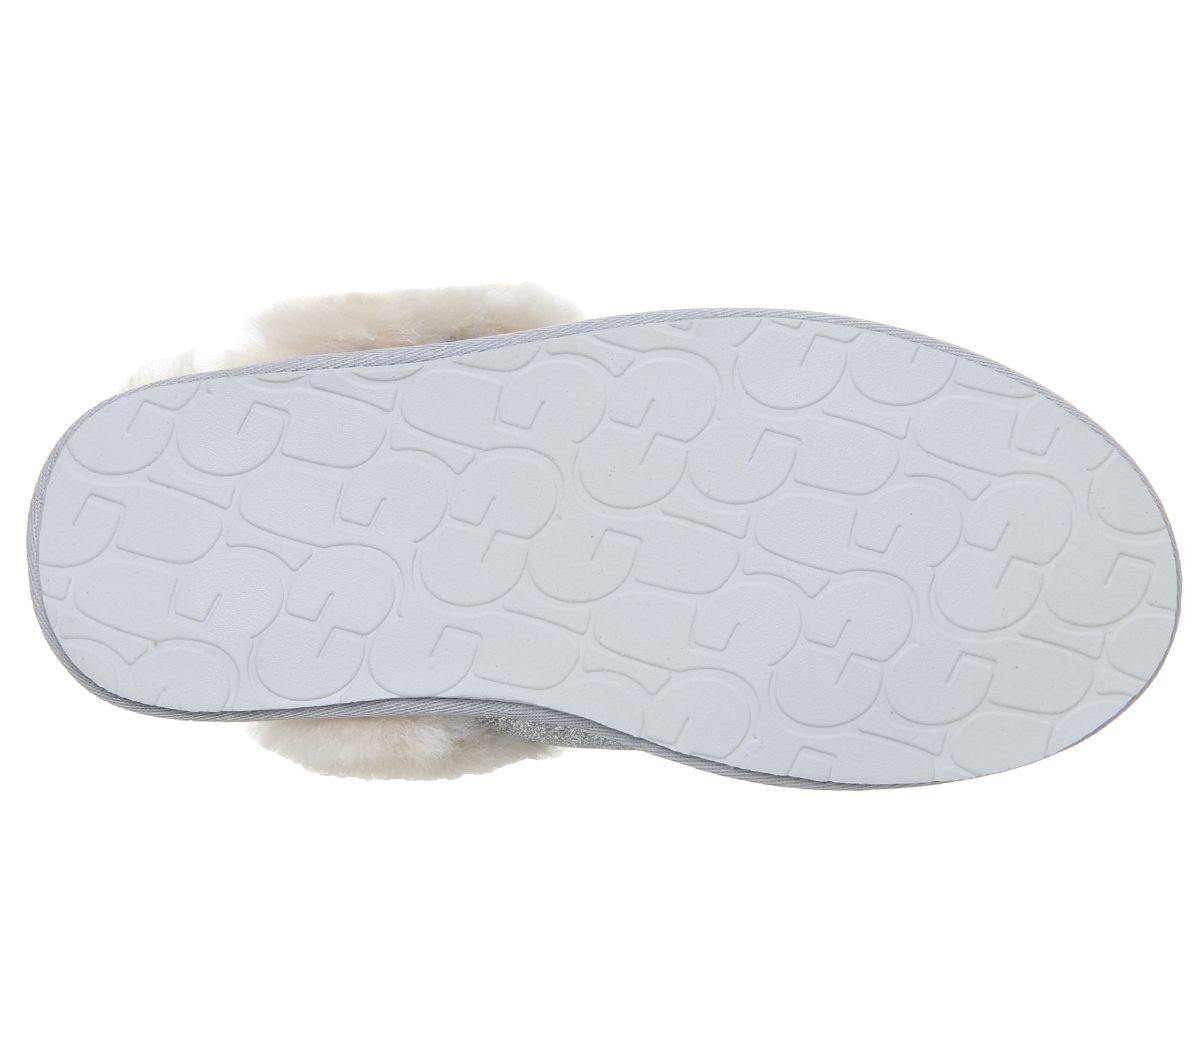 262850f40b73ce UGG Scuffette II Sparkle Slippers Silver - Flats